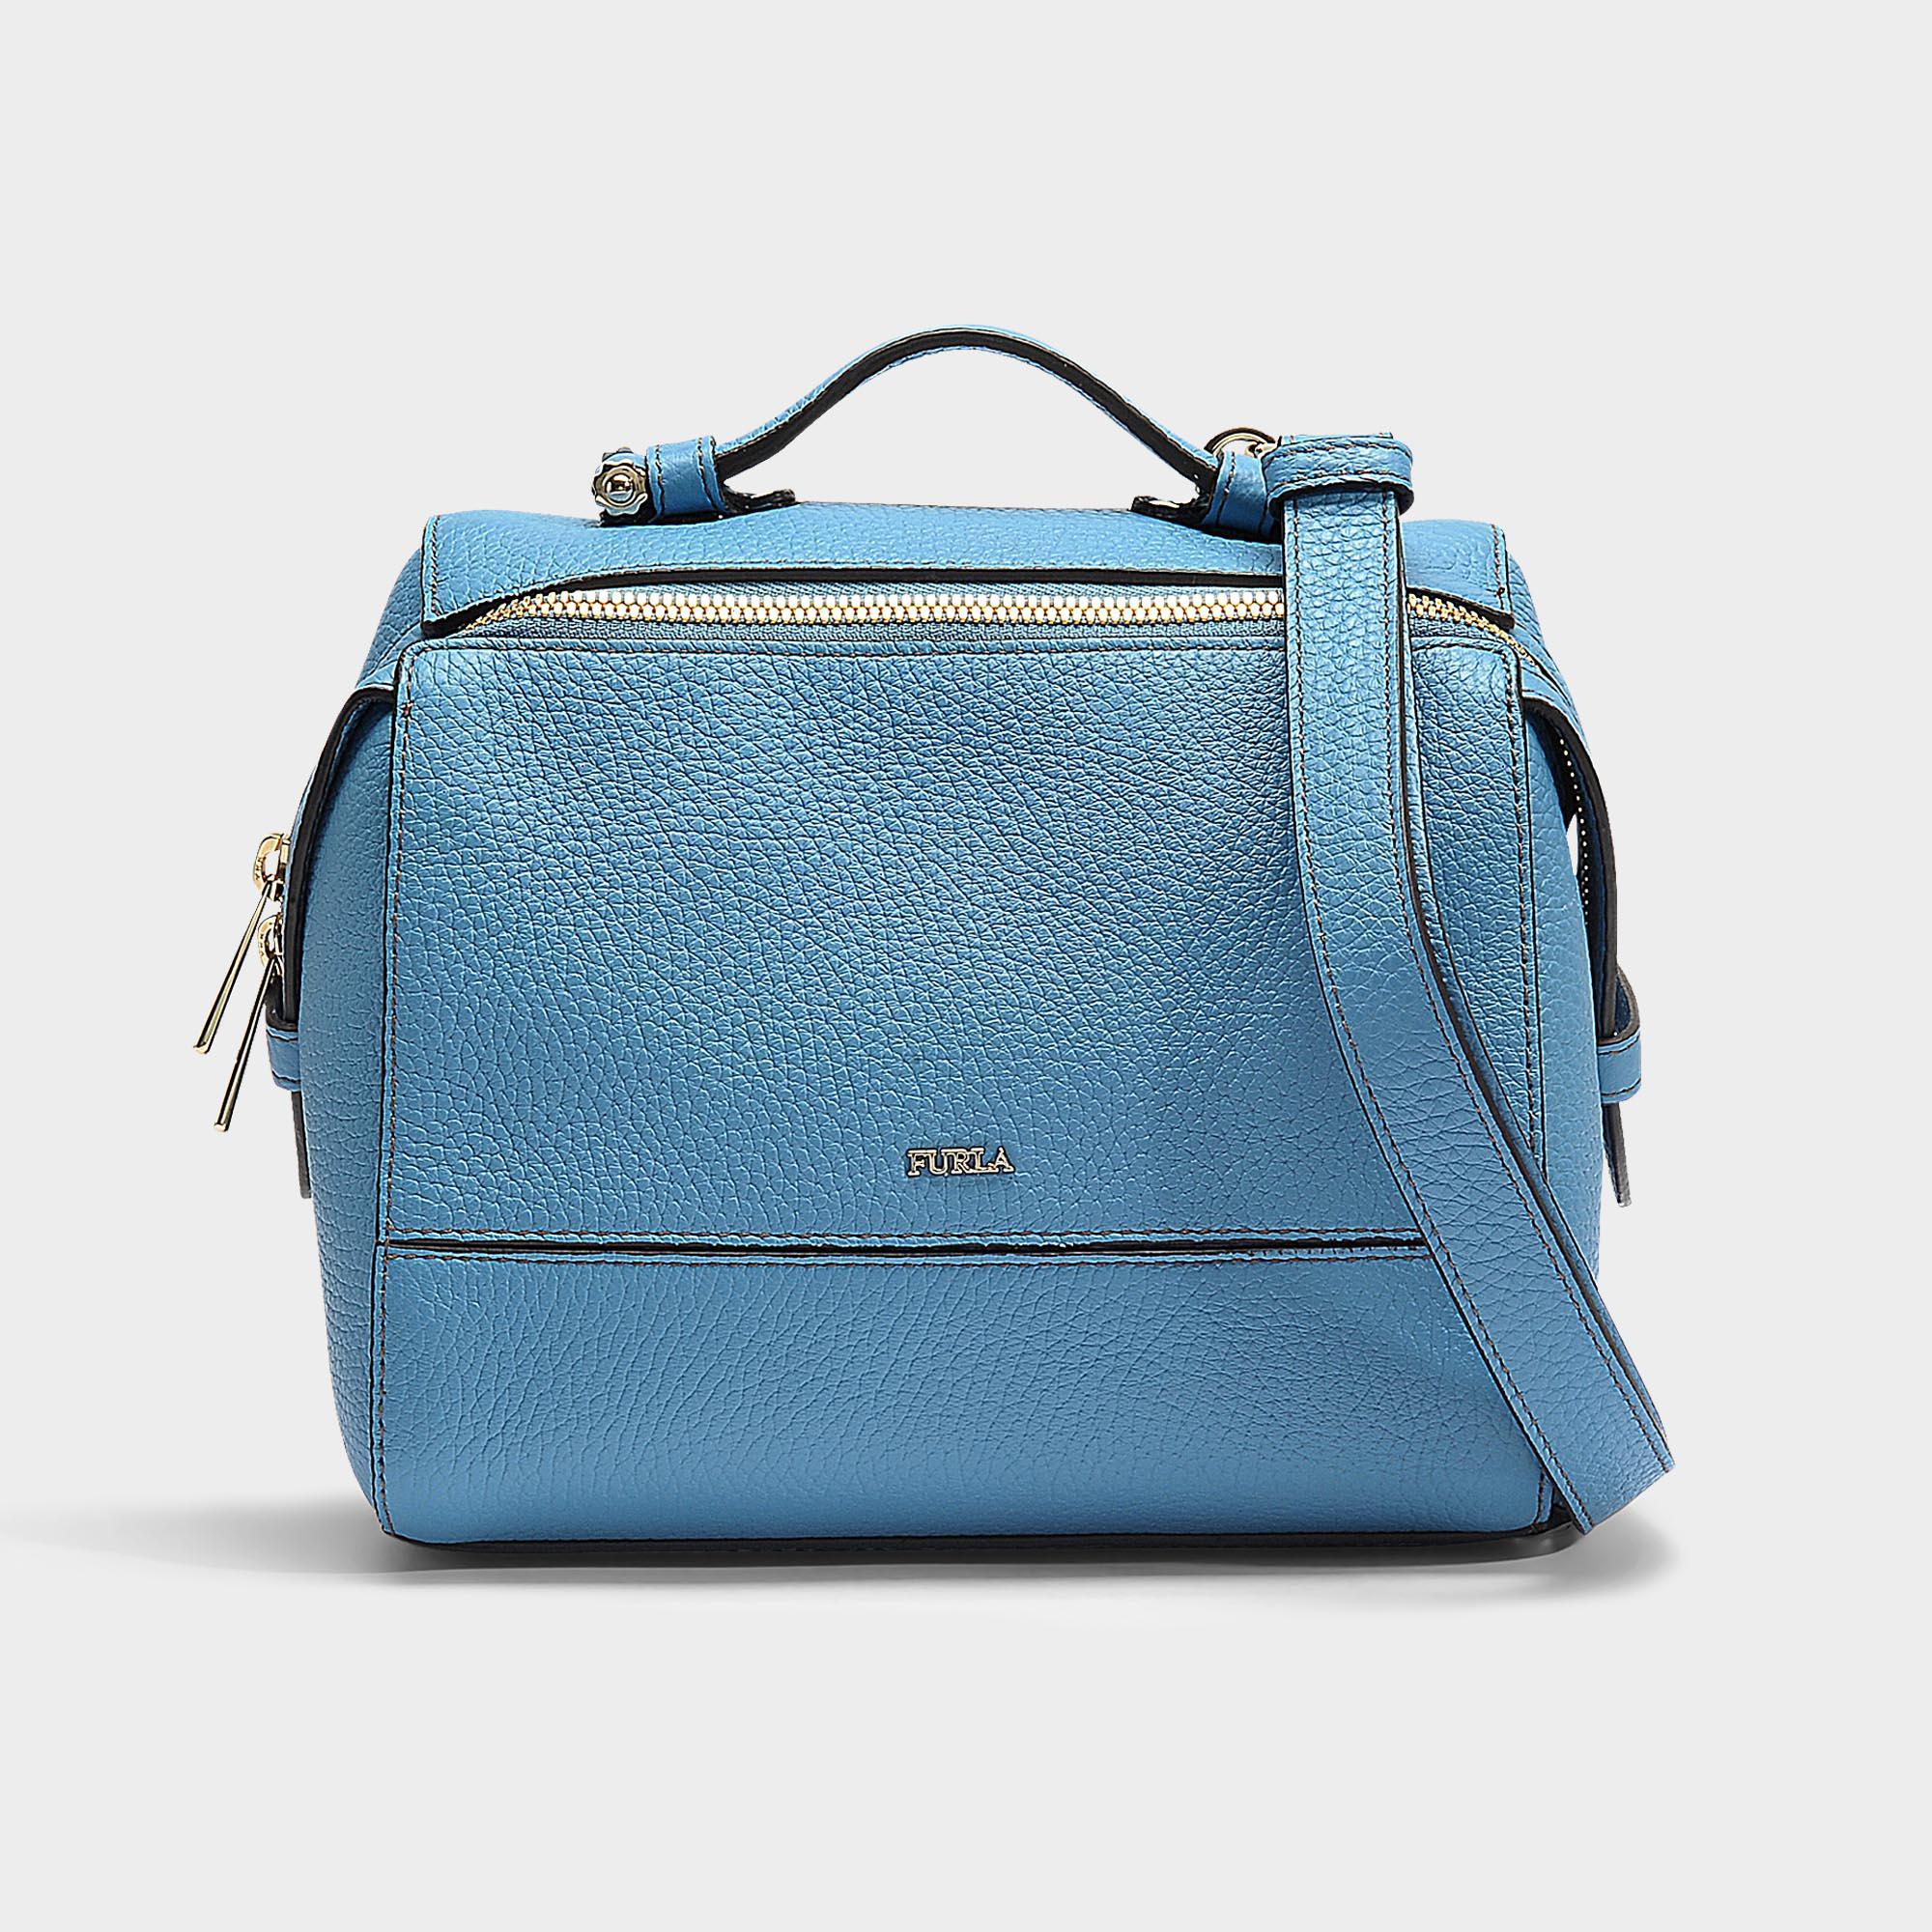 Dalia medium top handle bag Furla Clearance Footlocker Finishline Enjoy For Sale Buy Cheap With Mastercard Kho81MK1P